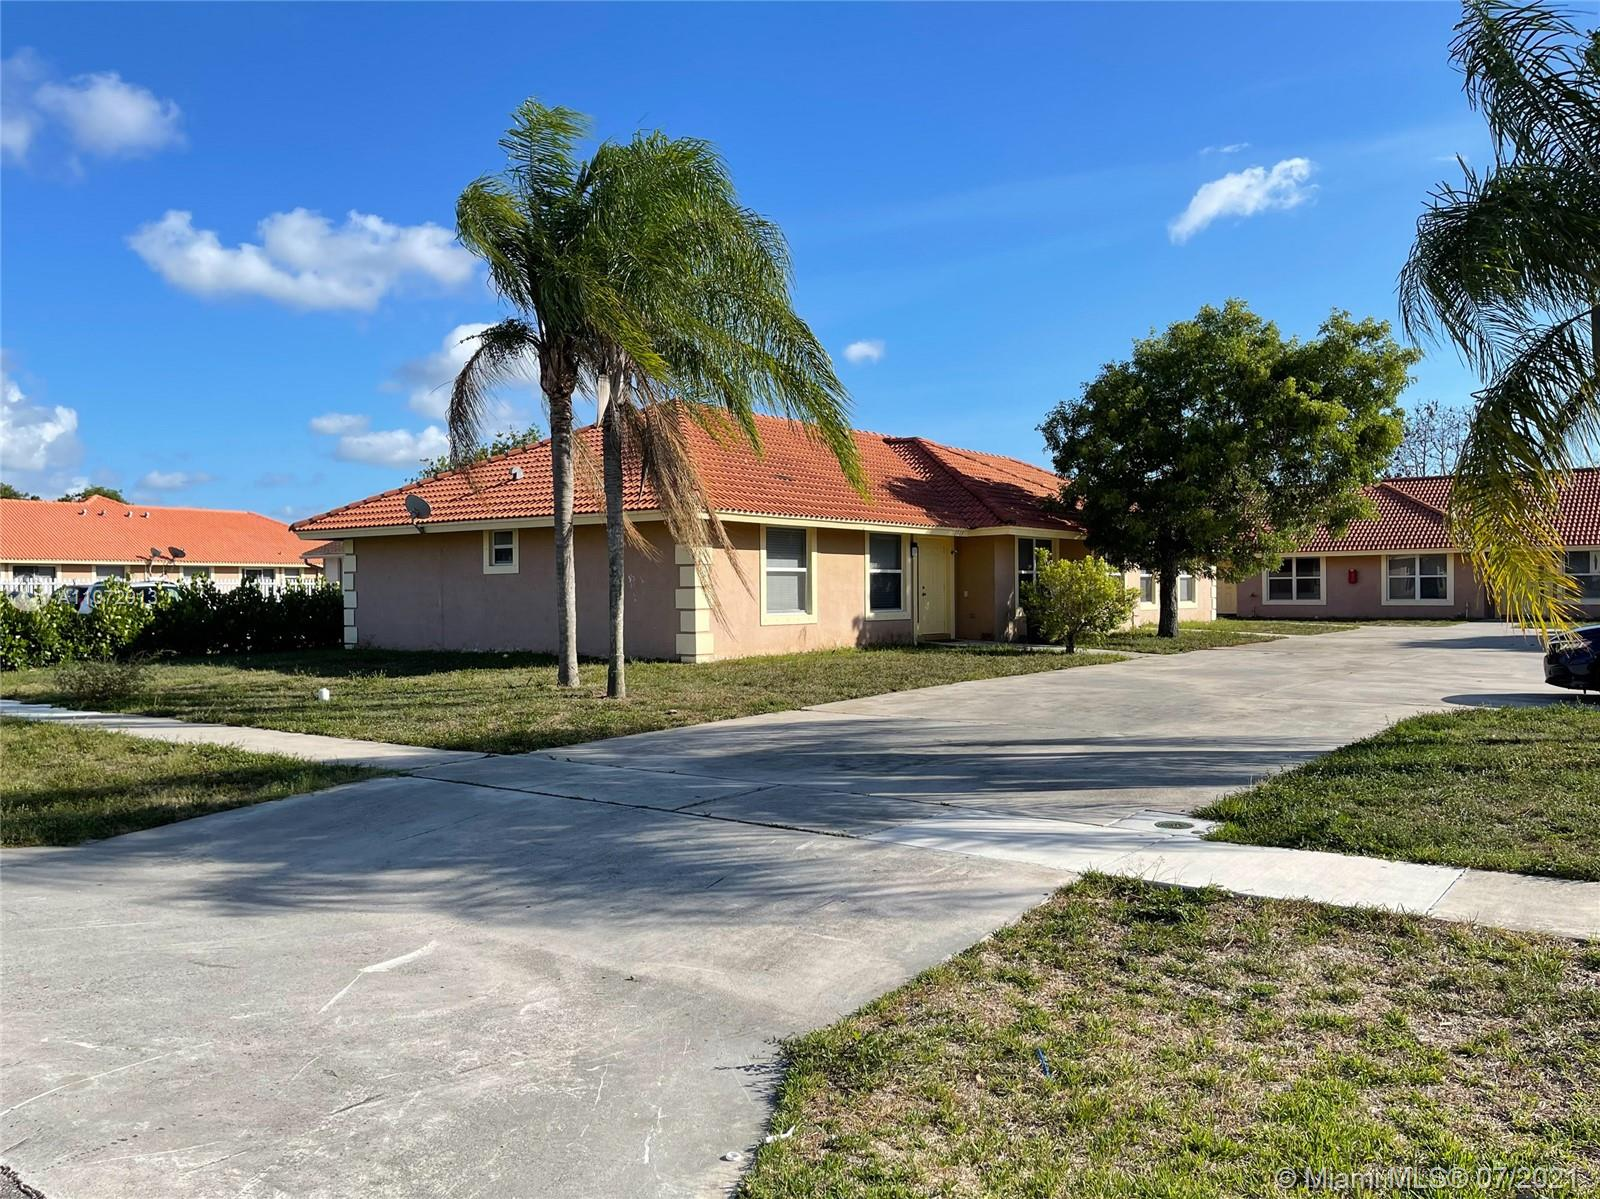 1343 The 12th Fairway, Wellington, Florida 33414